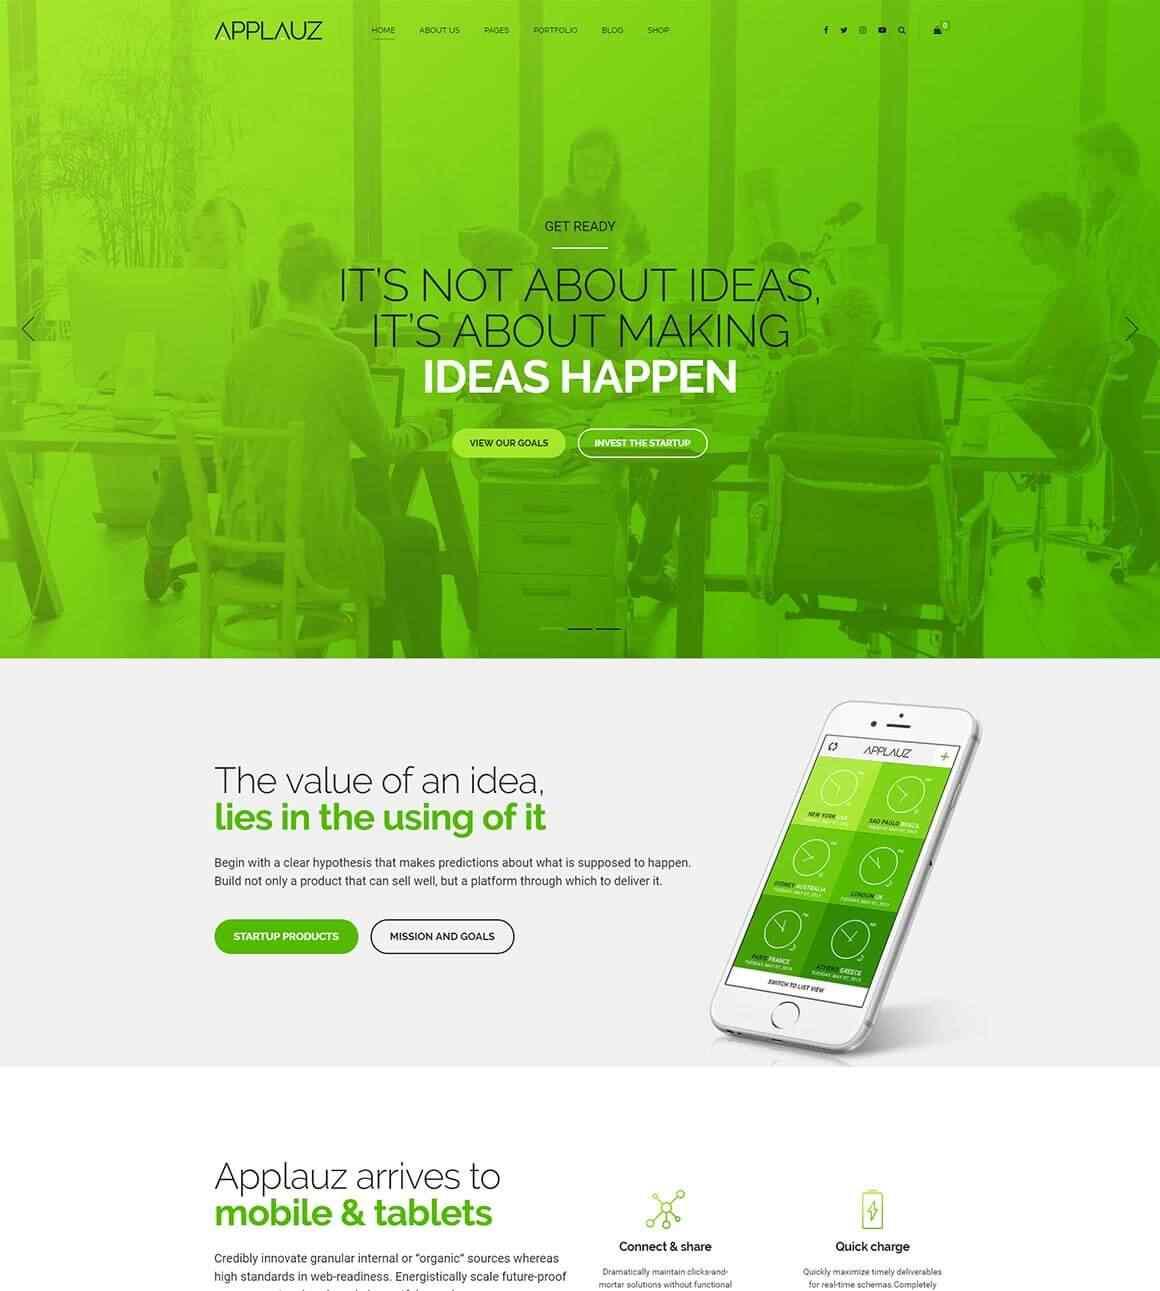 https://www.comdatec.com/wp-content/uploads/2017/11/Screenshot-Startup.jpg